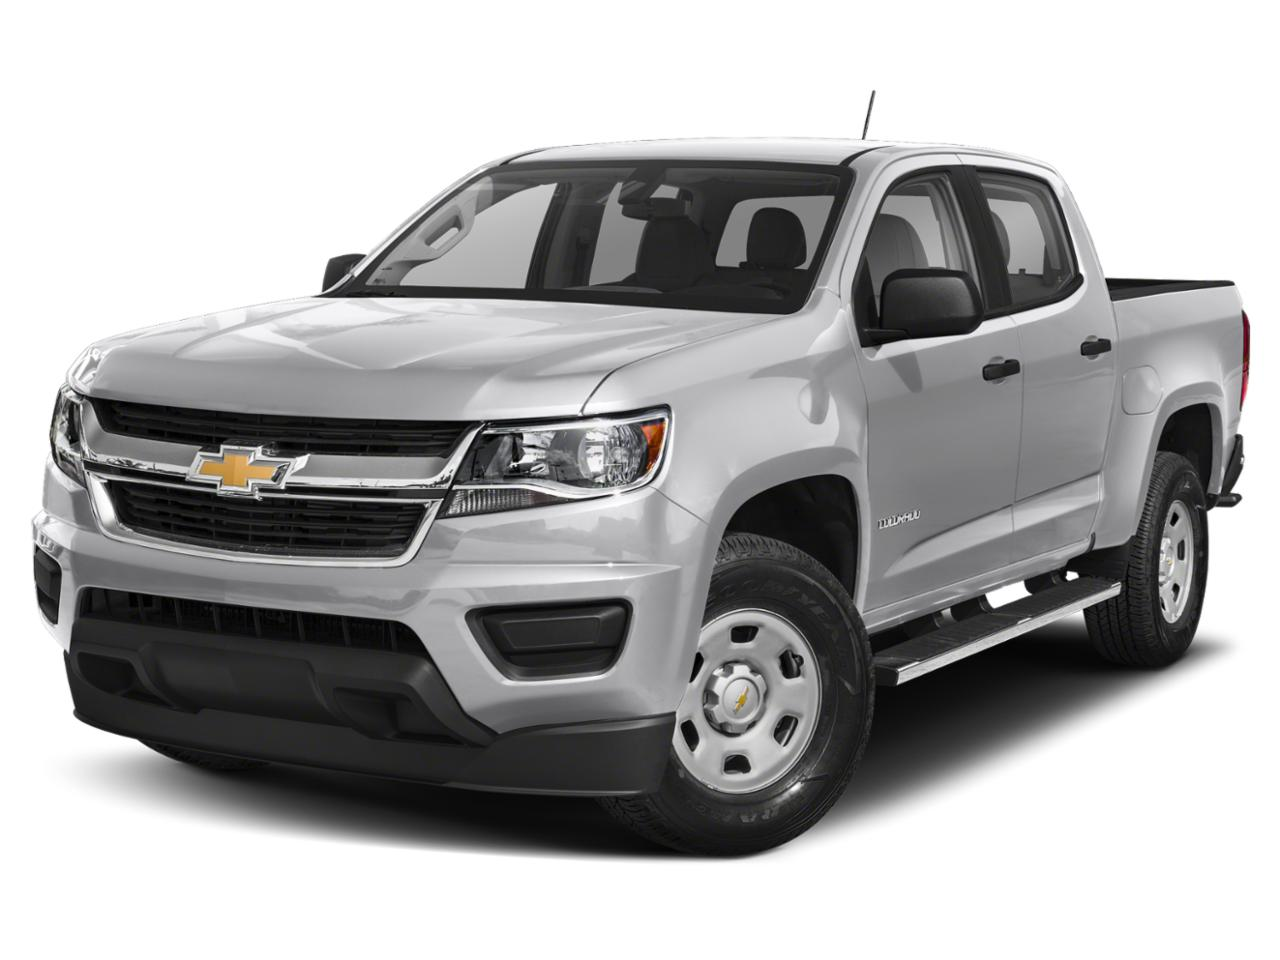 2020 Chevrolet Colorado WORK TRUCK Crew Cab Pickup Slide 0